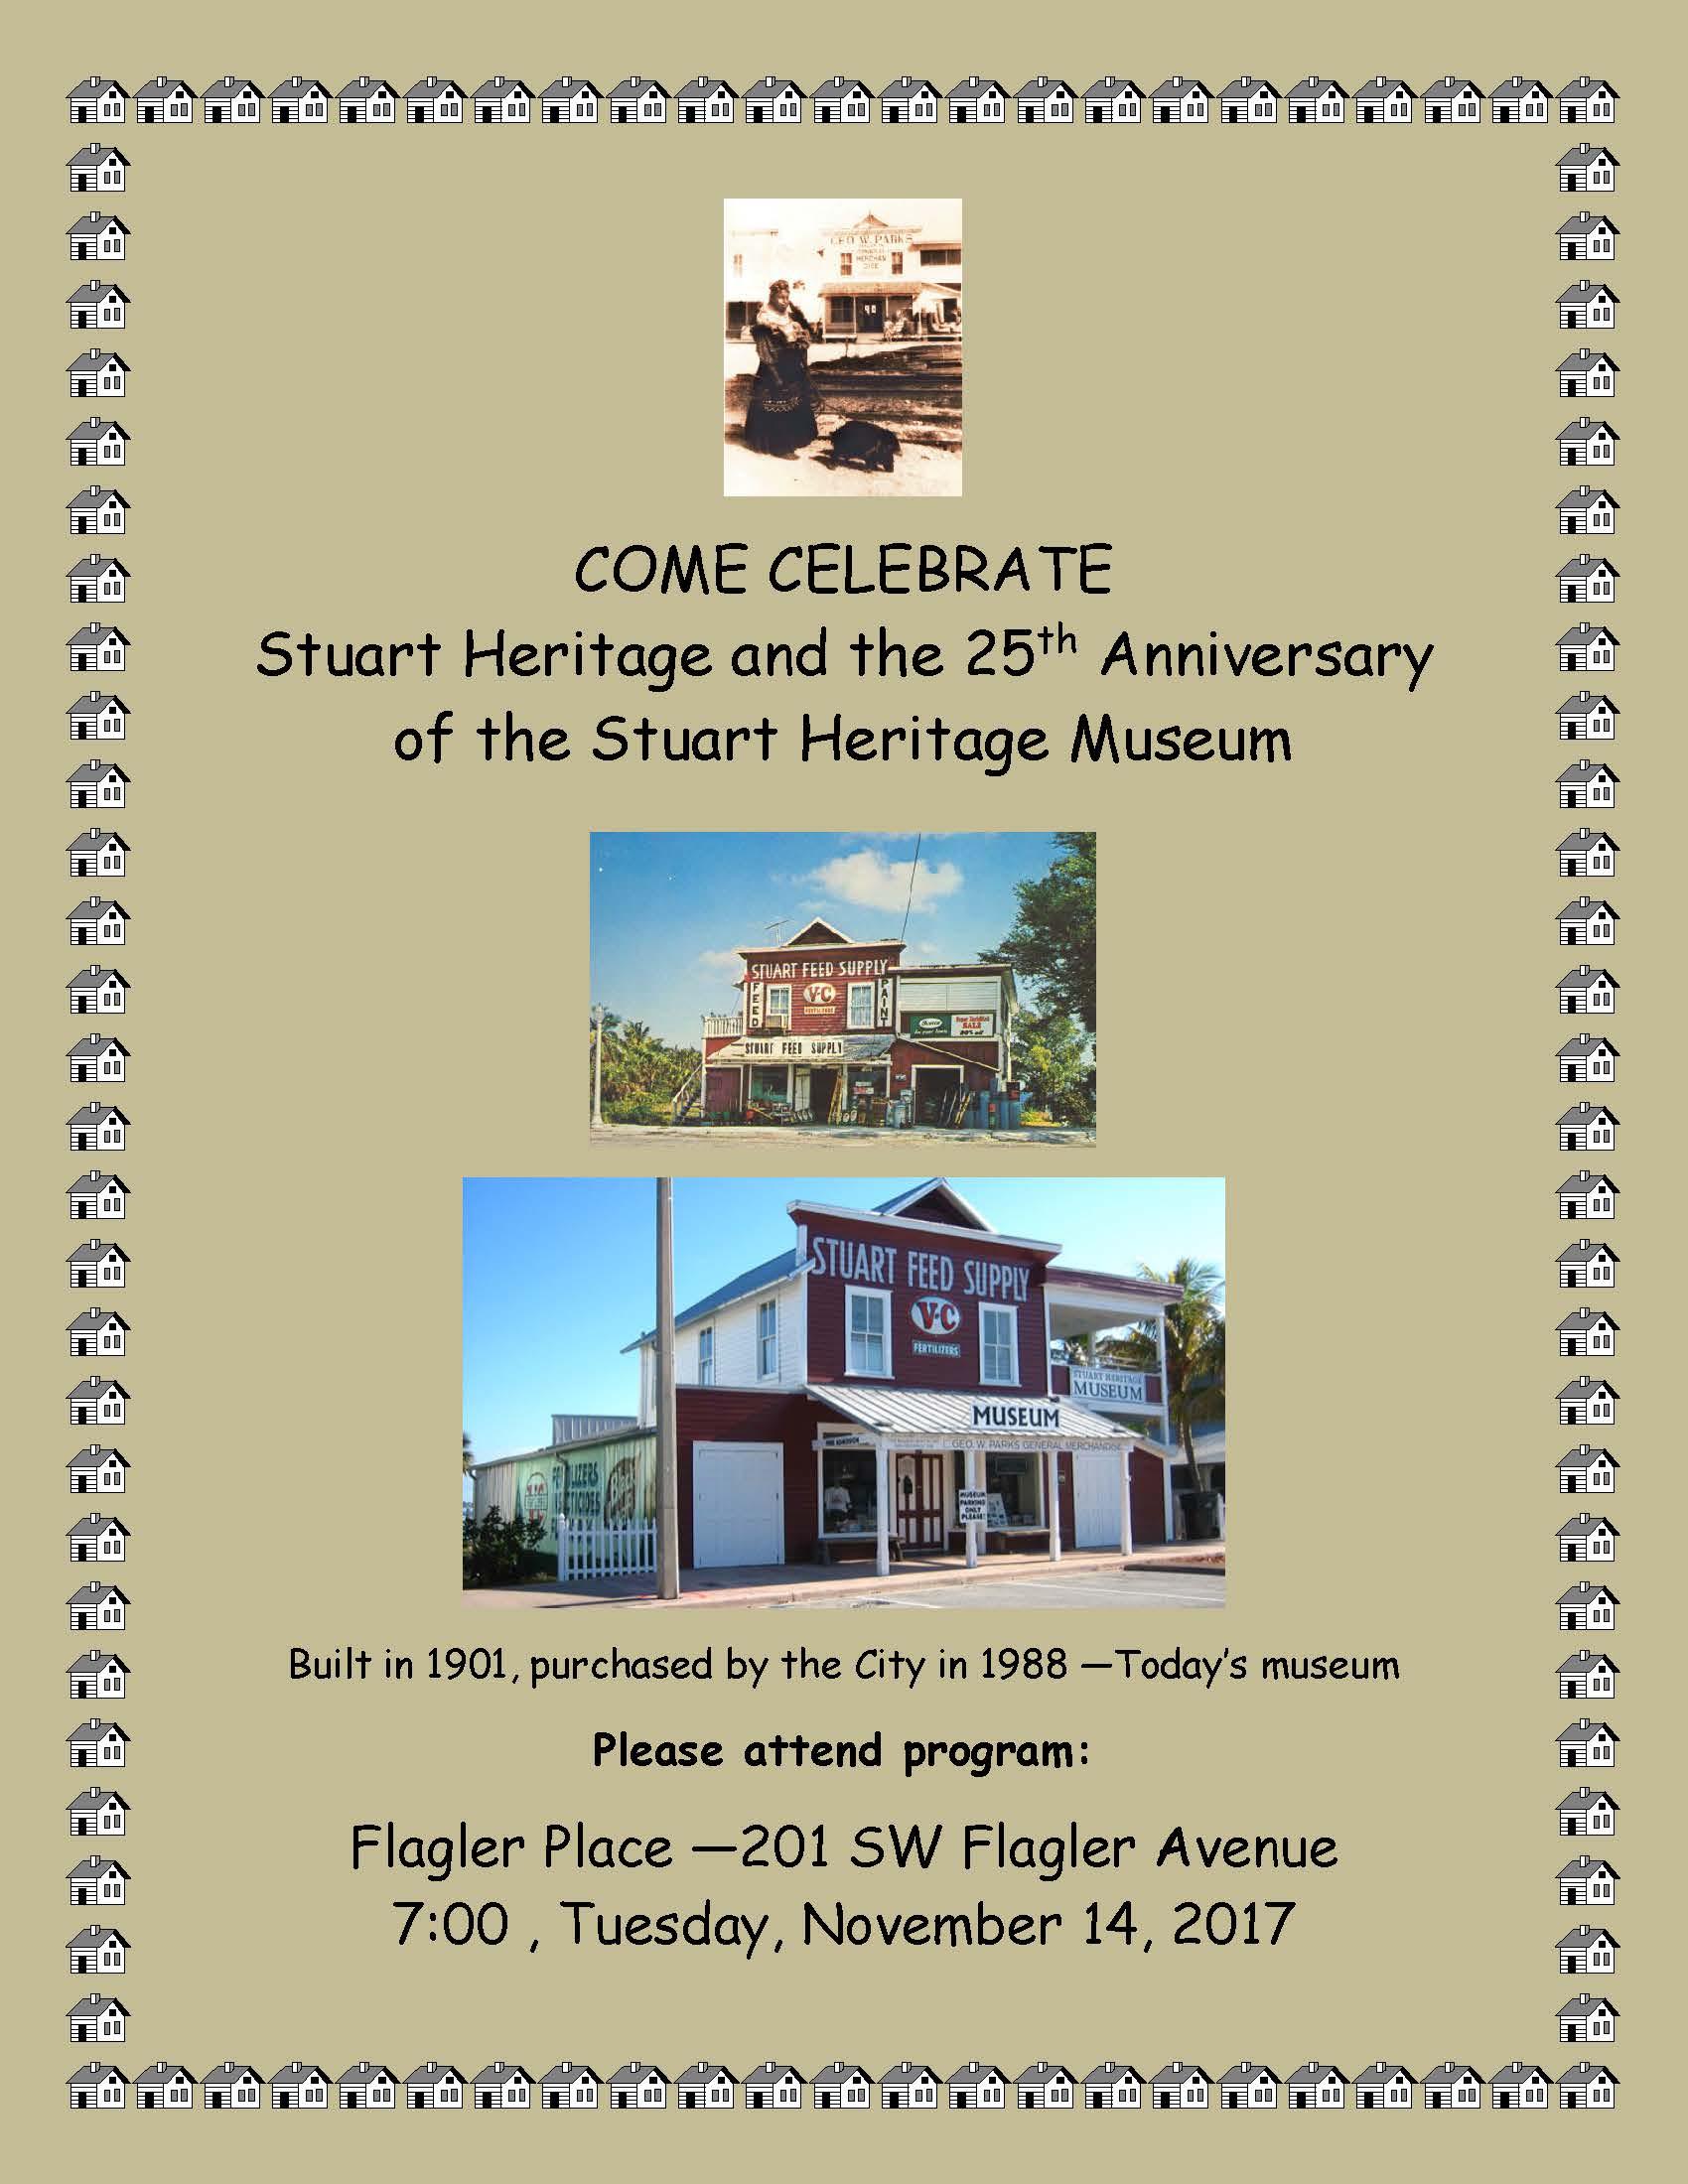 25th Anniversary of the Stuart Heritage Museum